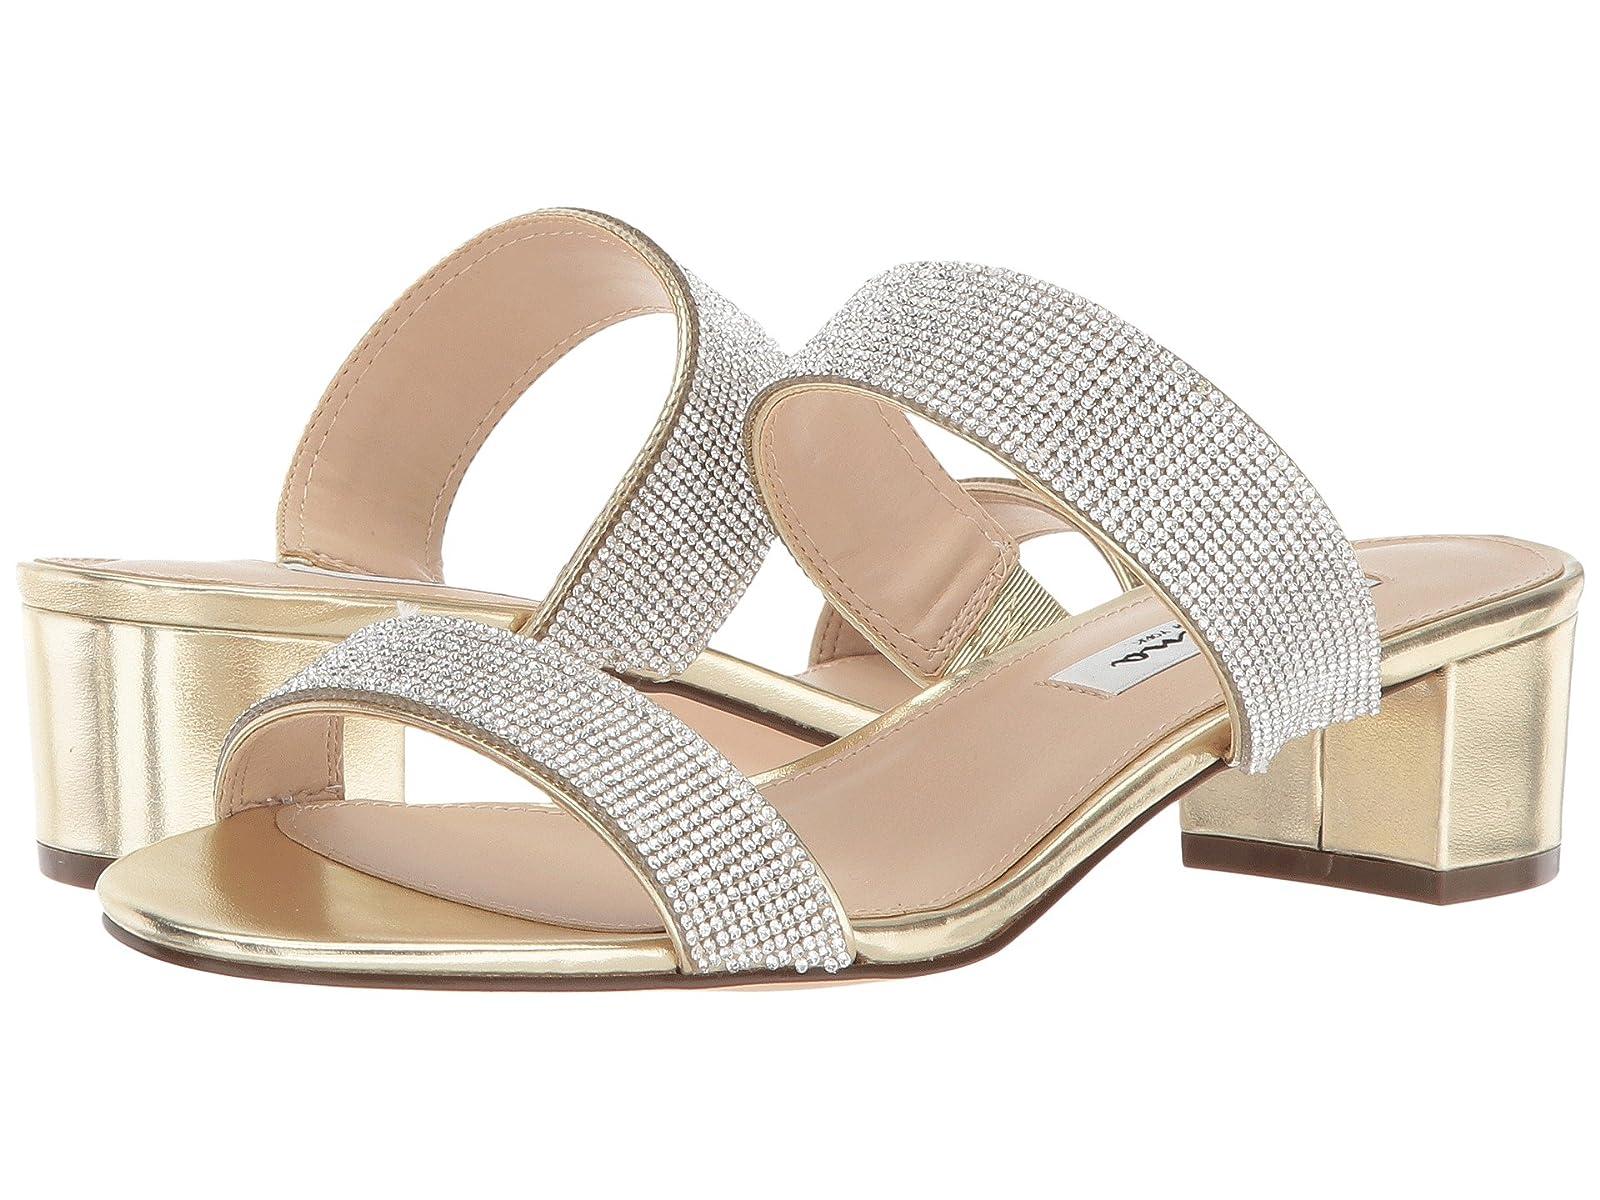 Nina GeorgeaAtmospheric grades have affordable shoes